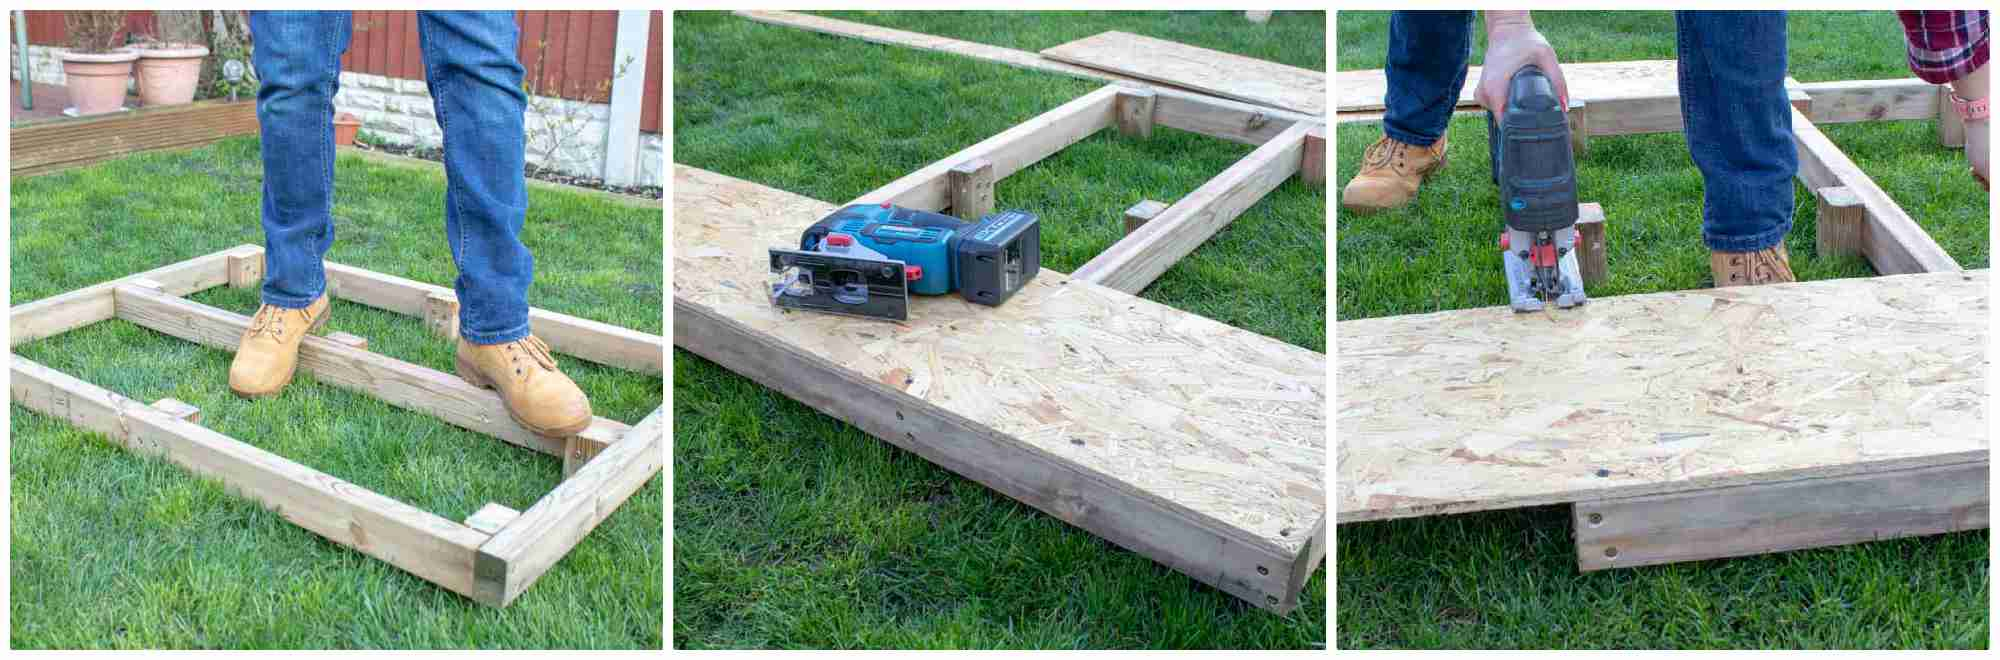 adding OSB flooring to dog kennel base